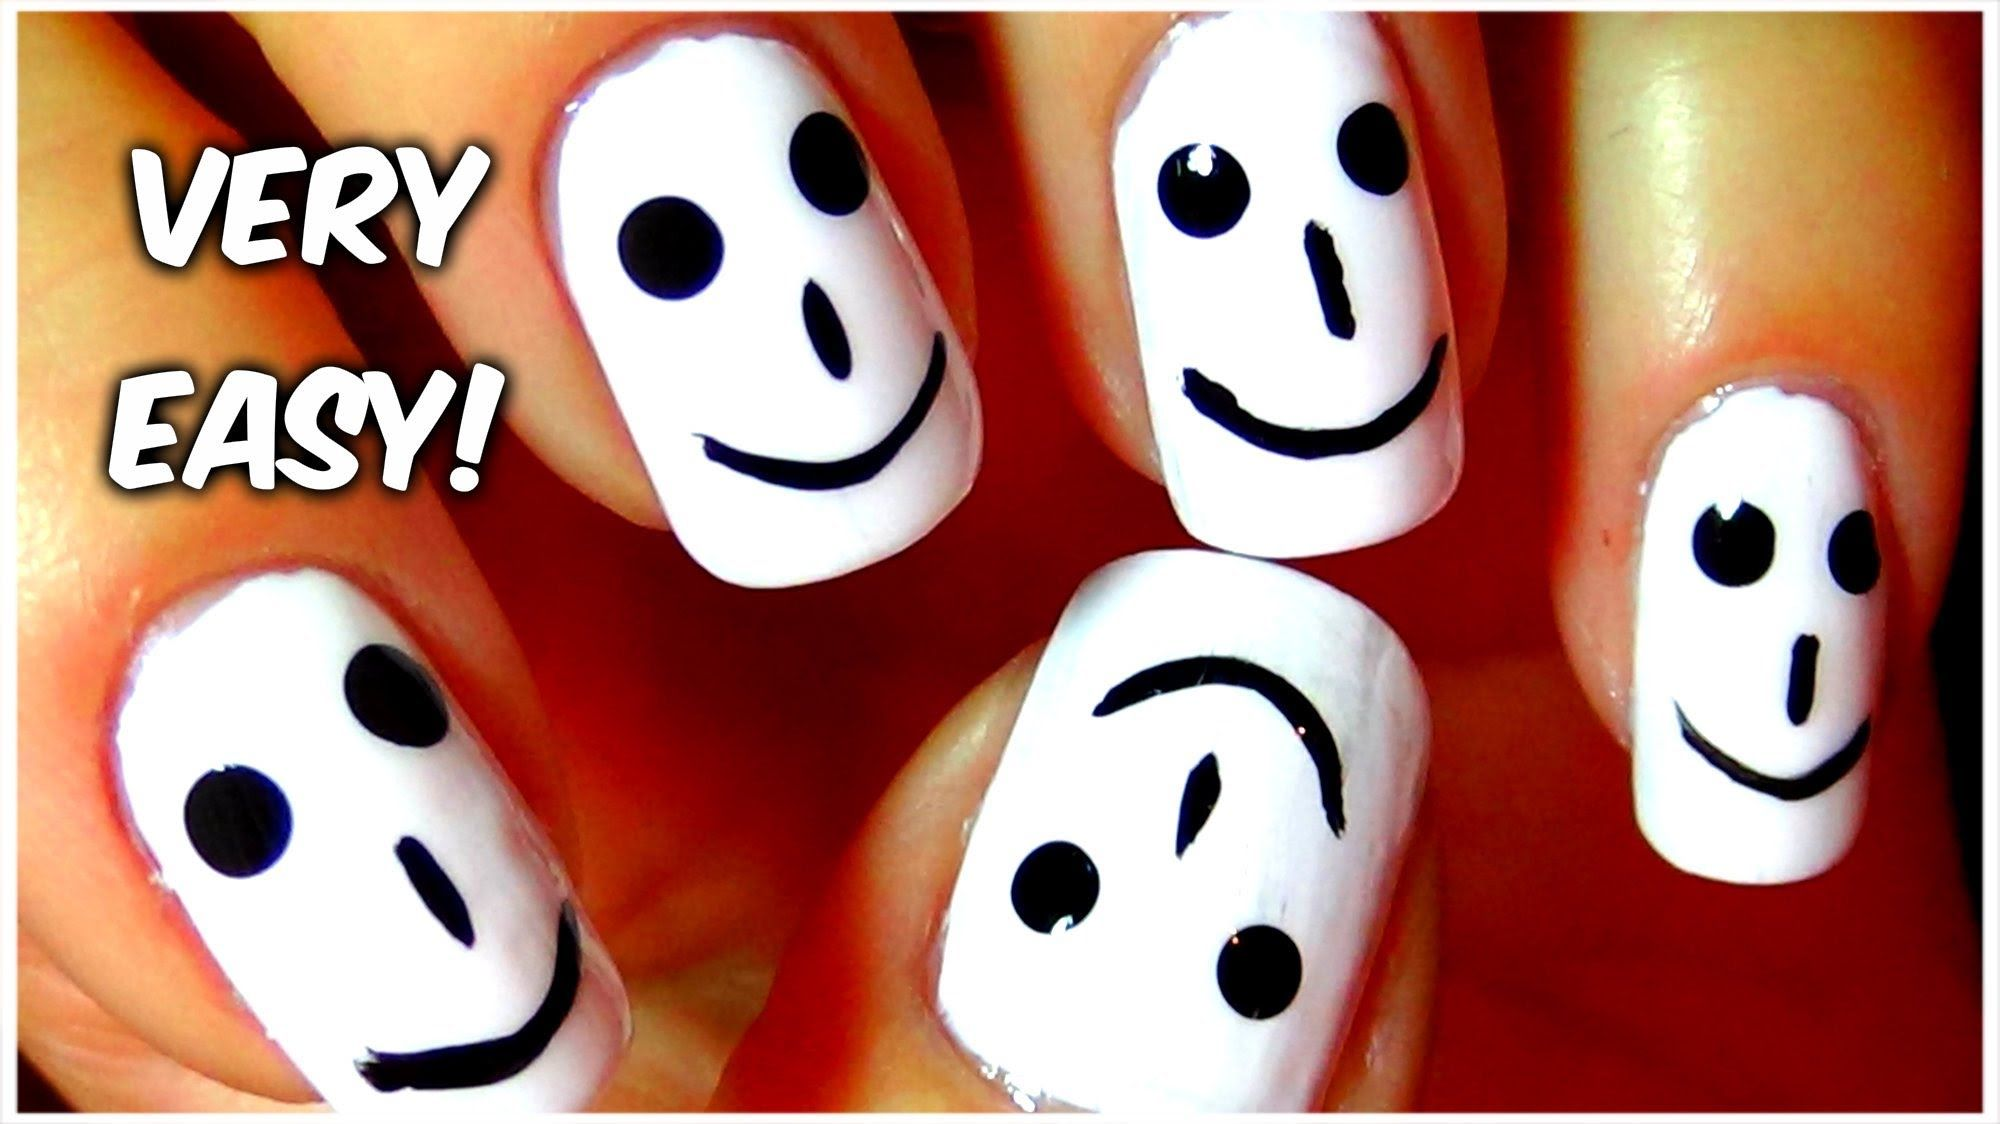 DIY Happy Smiles Nail Art pics